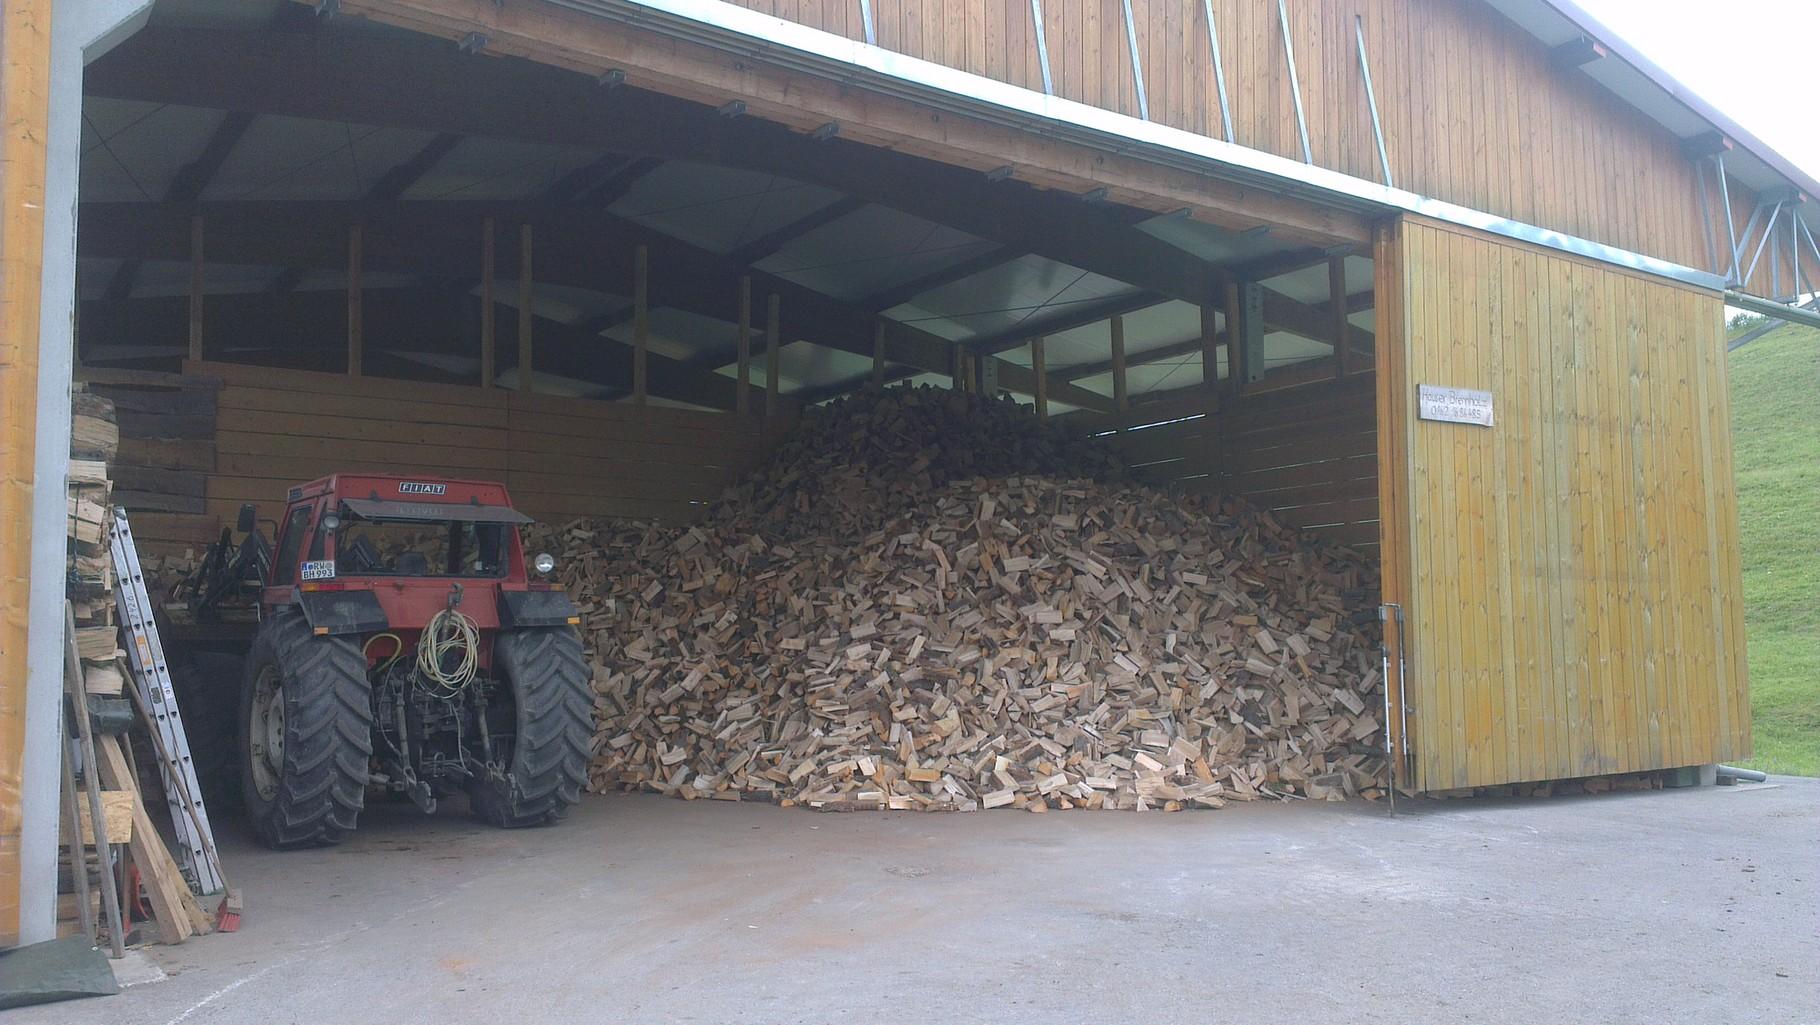 ofenfertiges Brennholz im Lager